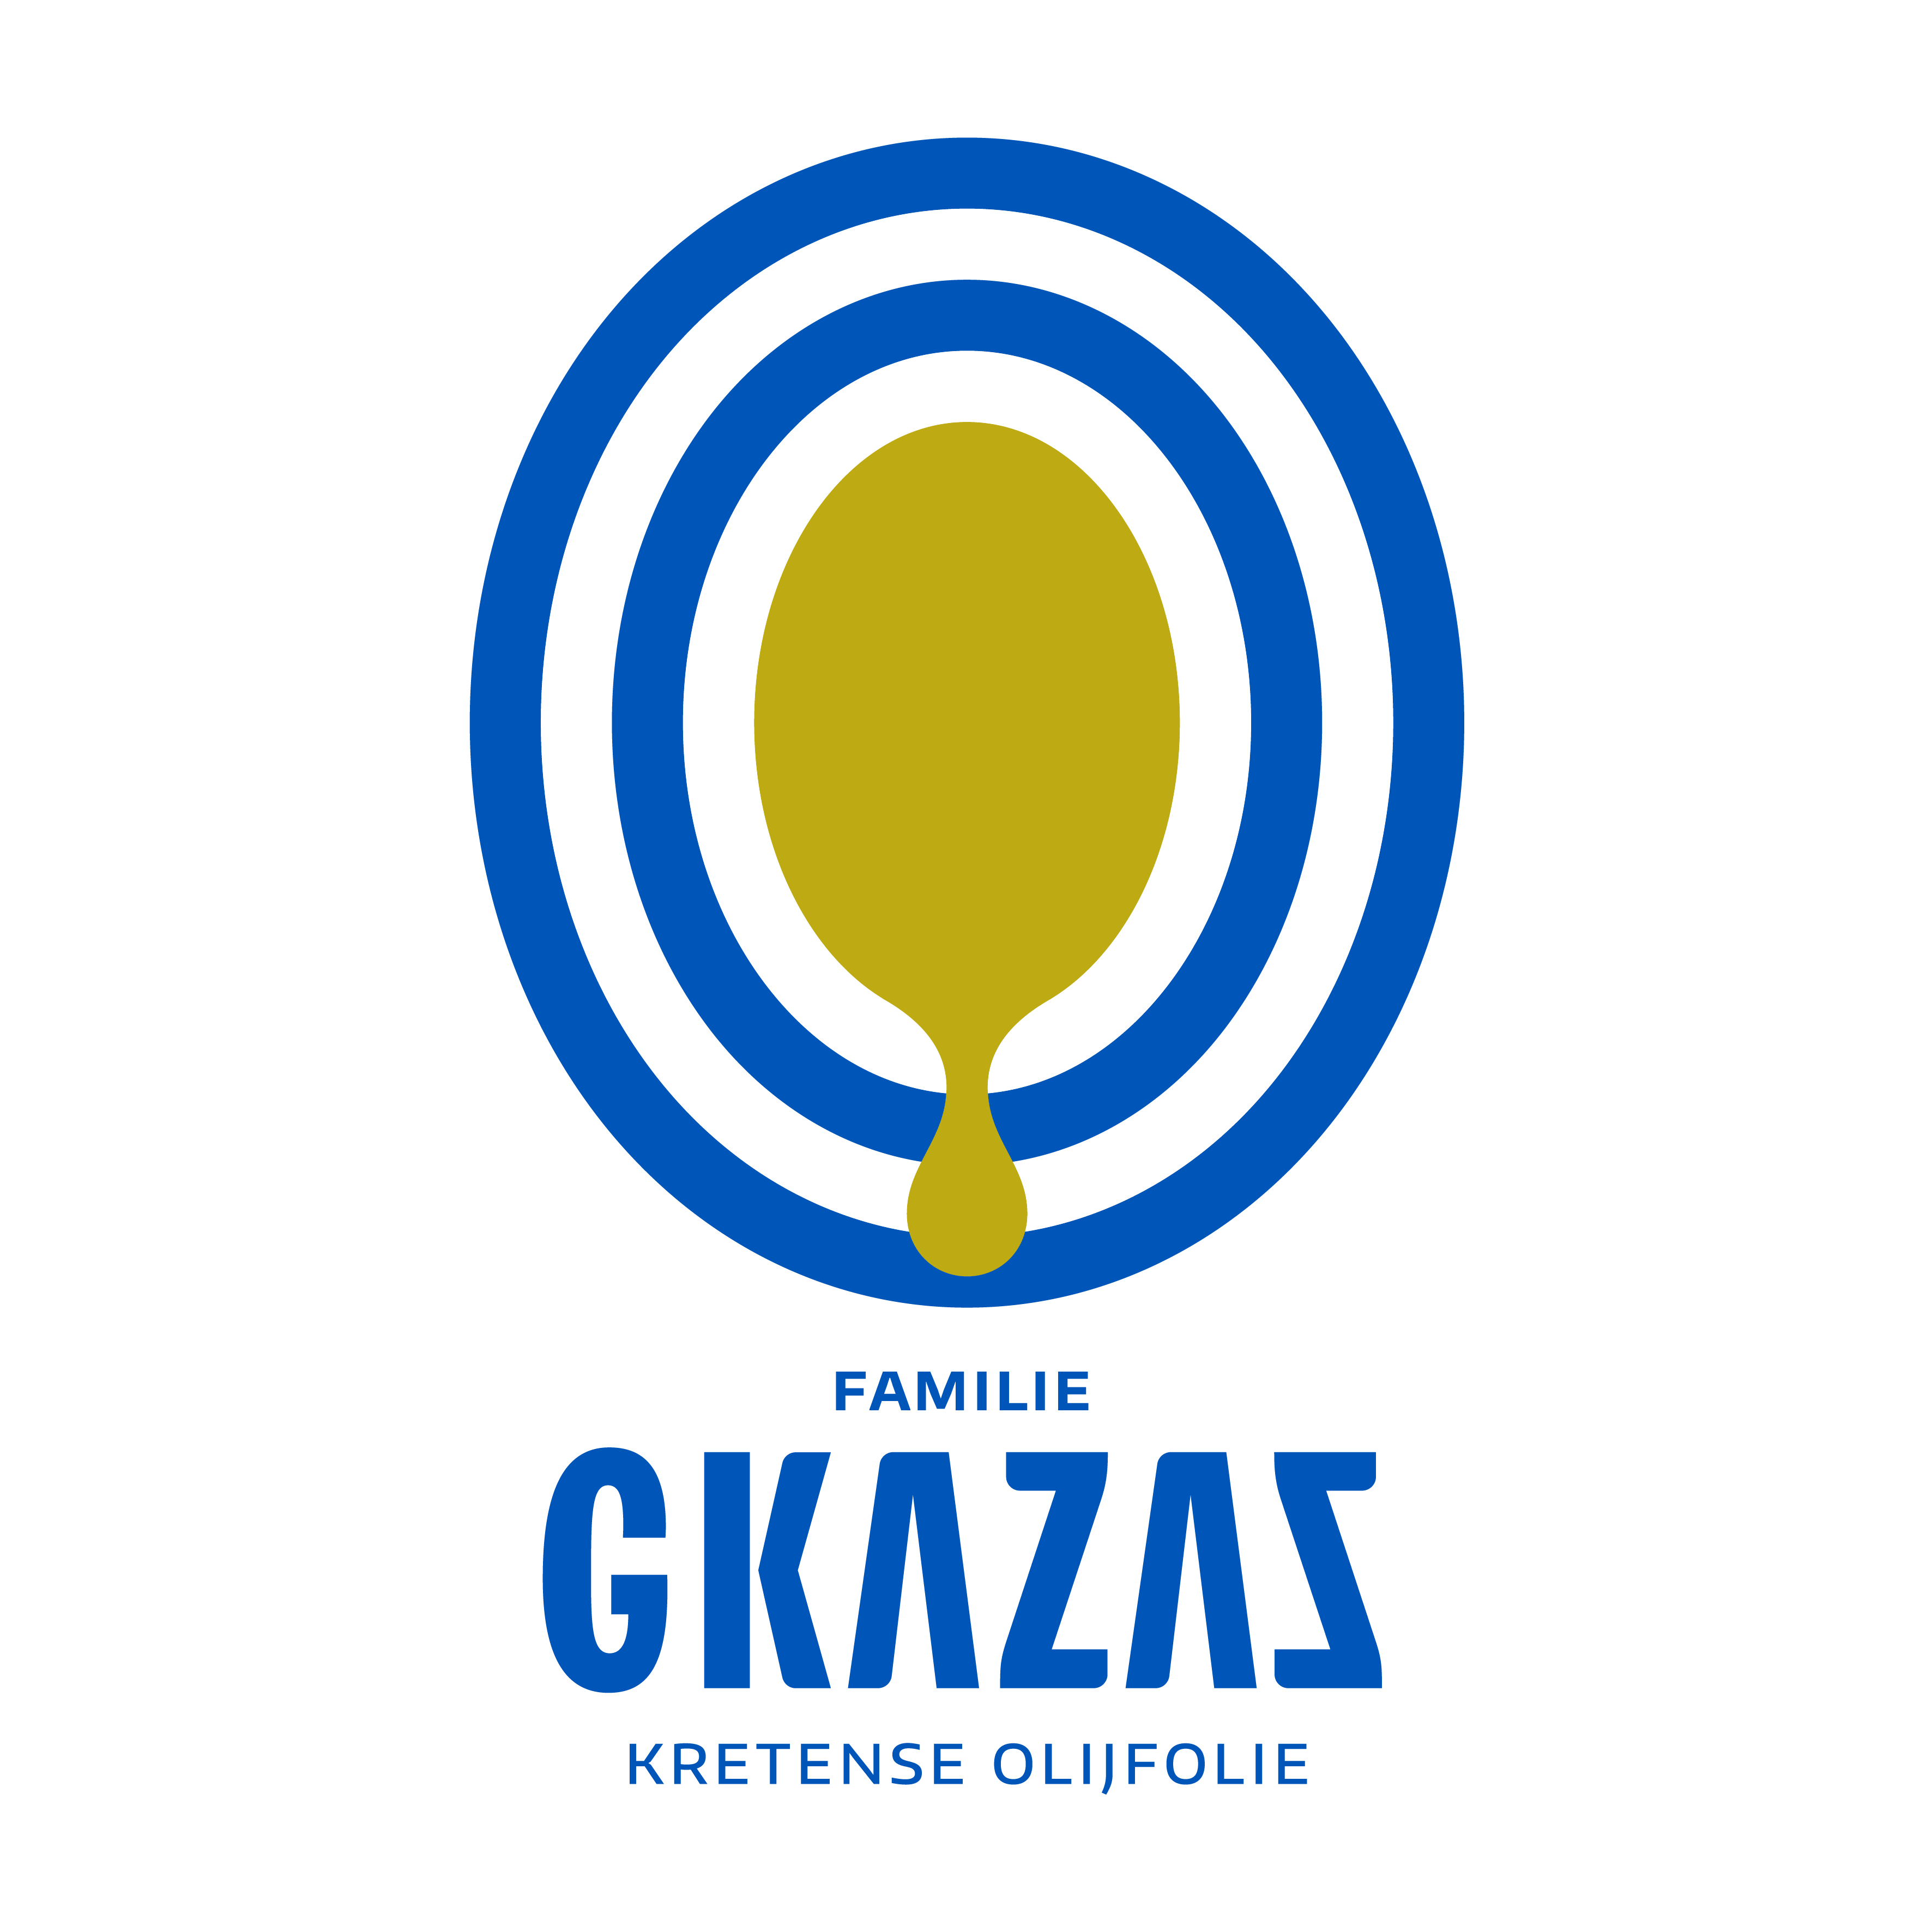 Gkazas Olijfolie - extra virgin olive oil from Crete